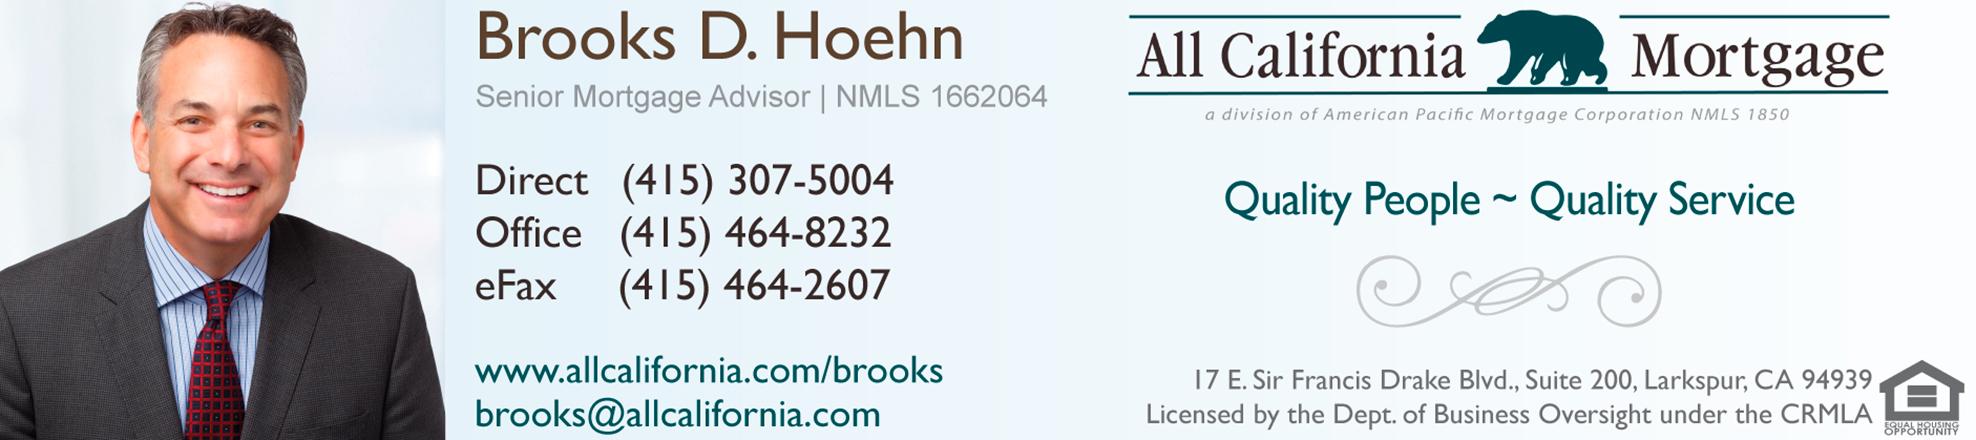 brooks-email-sig.jpg